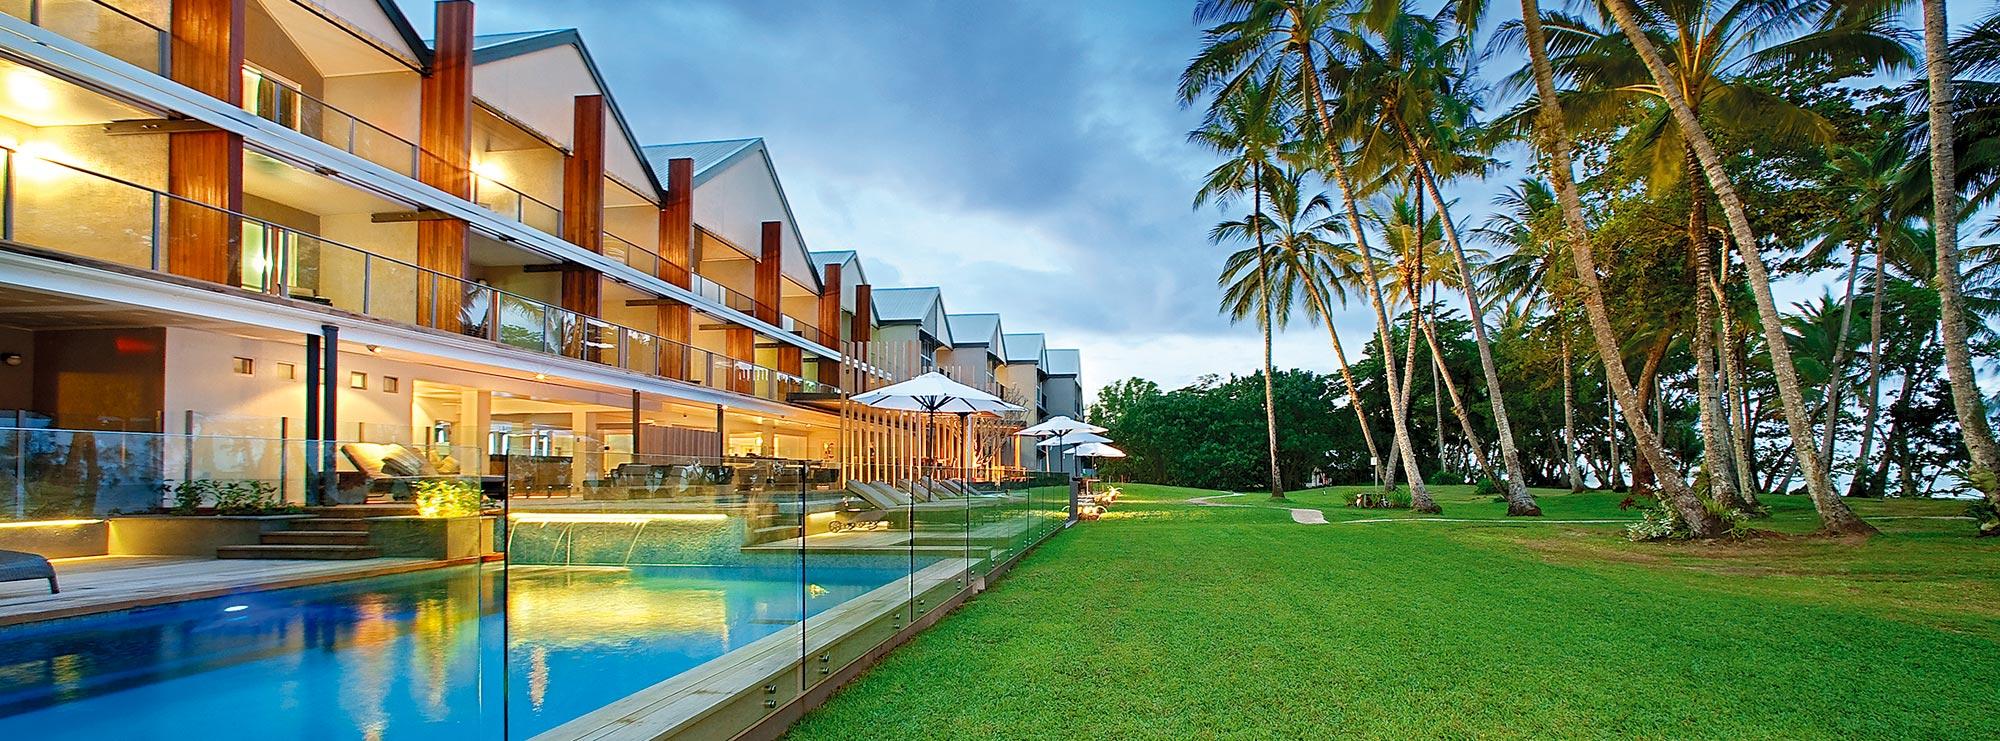 Mission Beach Accommodation Castaways Resort Spa